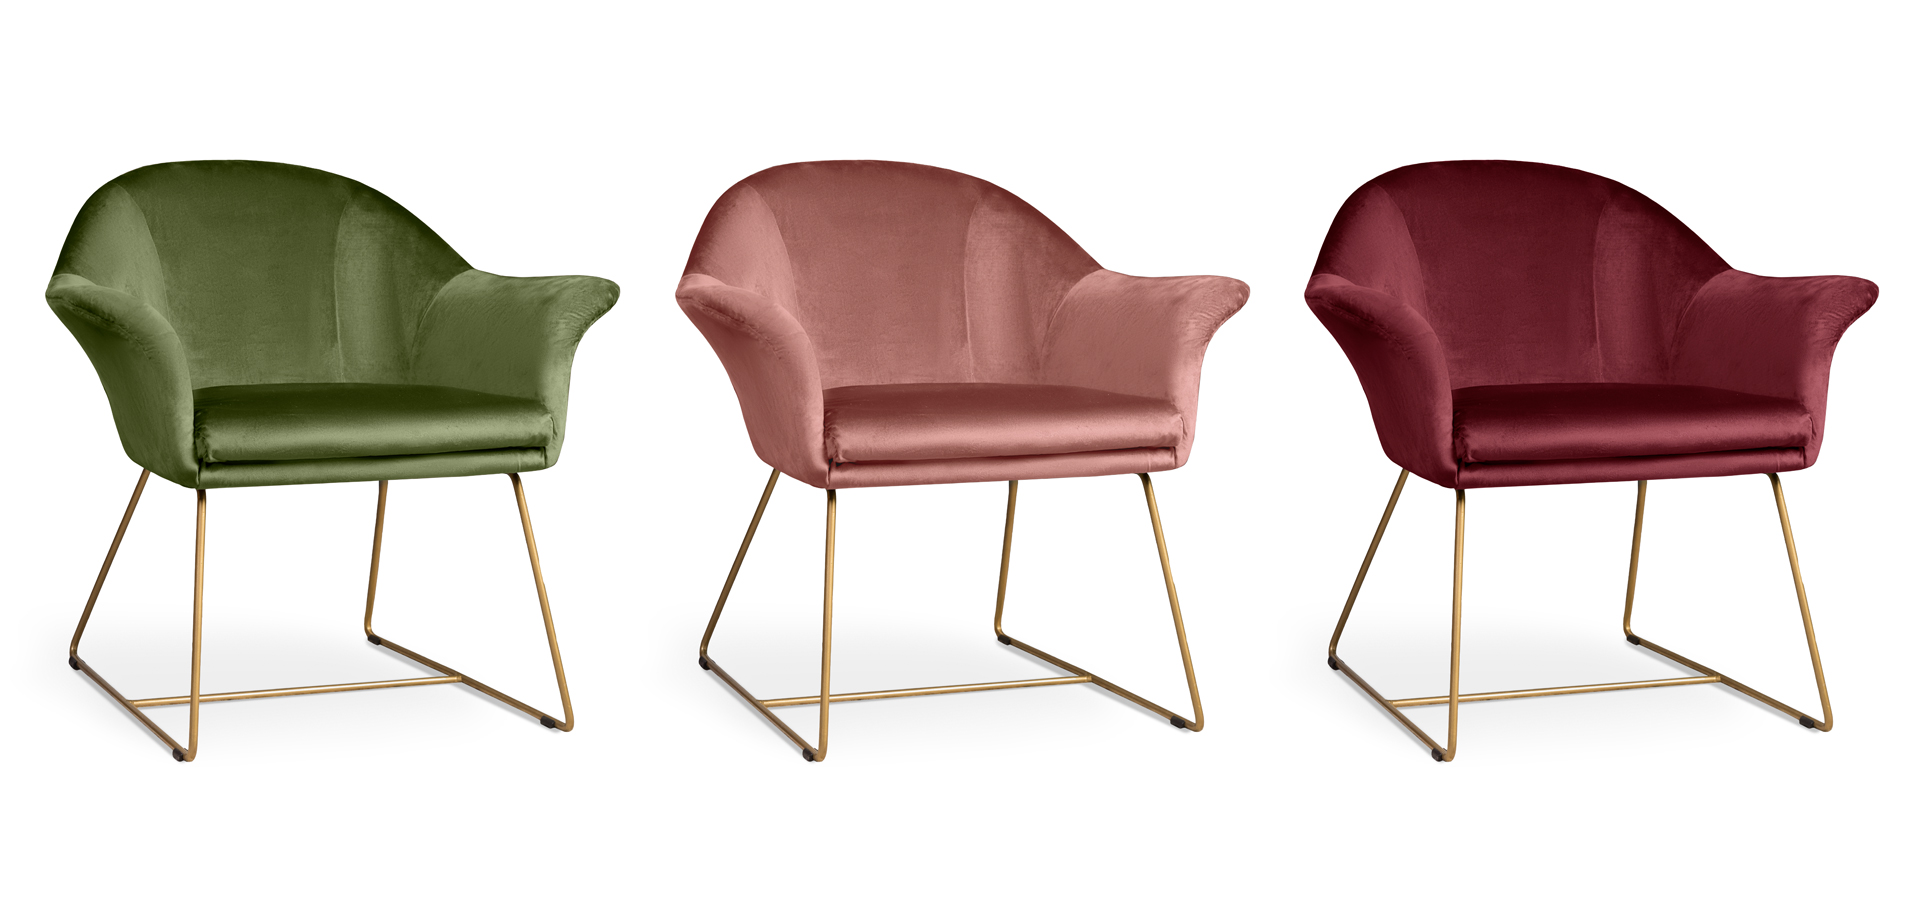 form-fotel-01.jpg